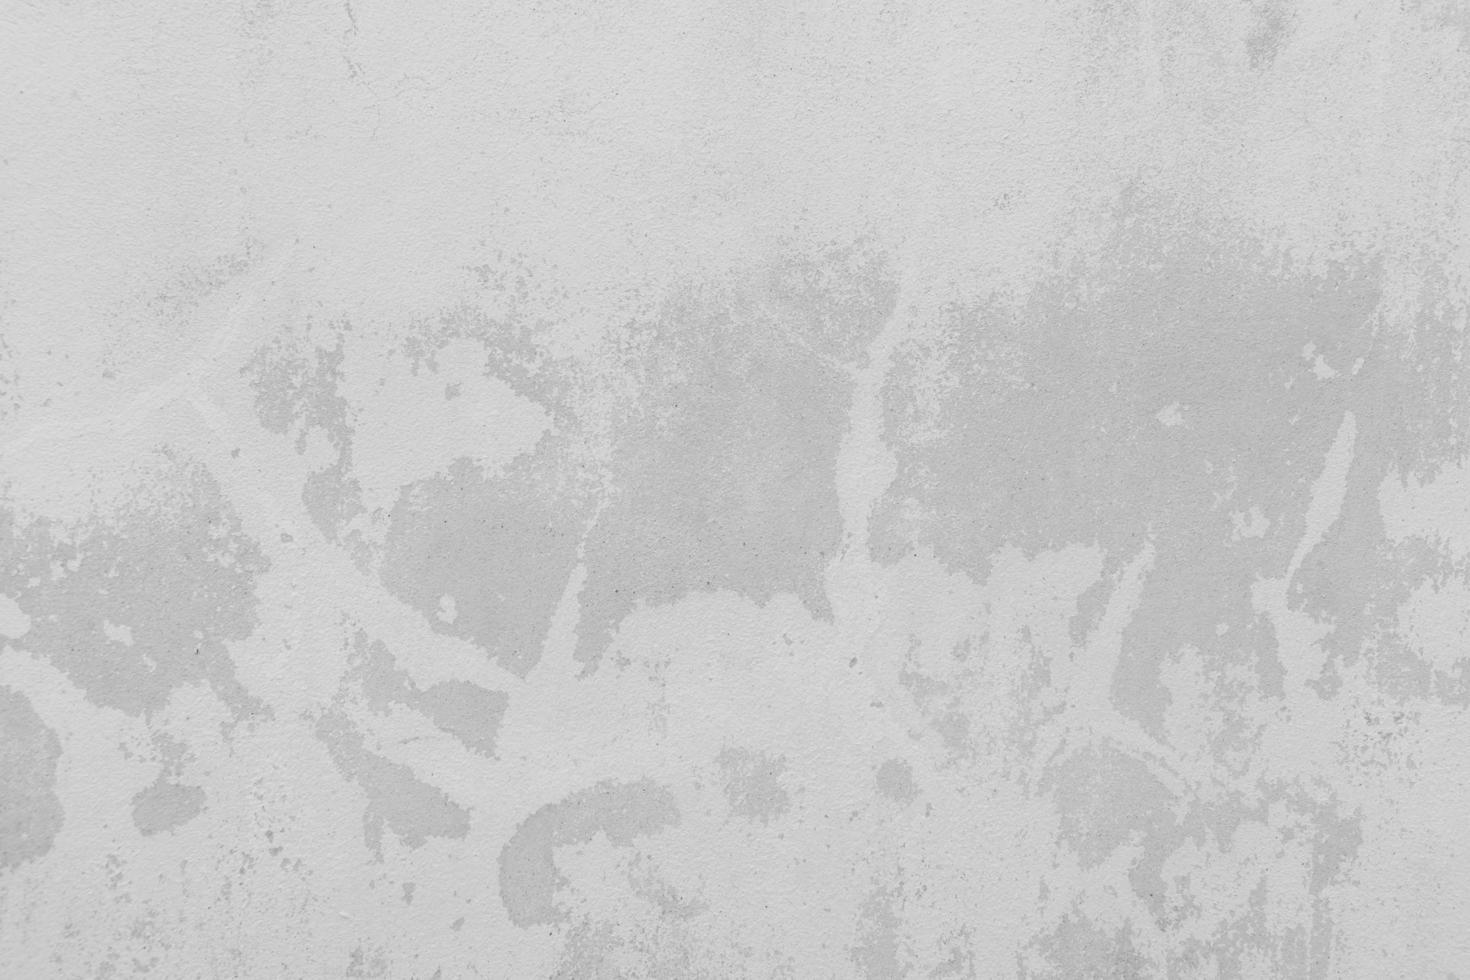 witte betonnen textuur foto